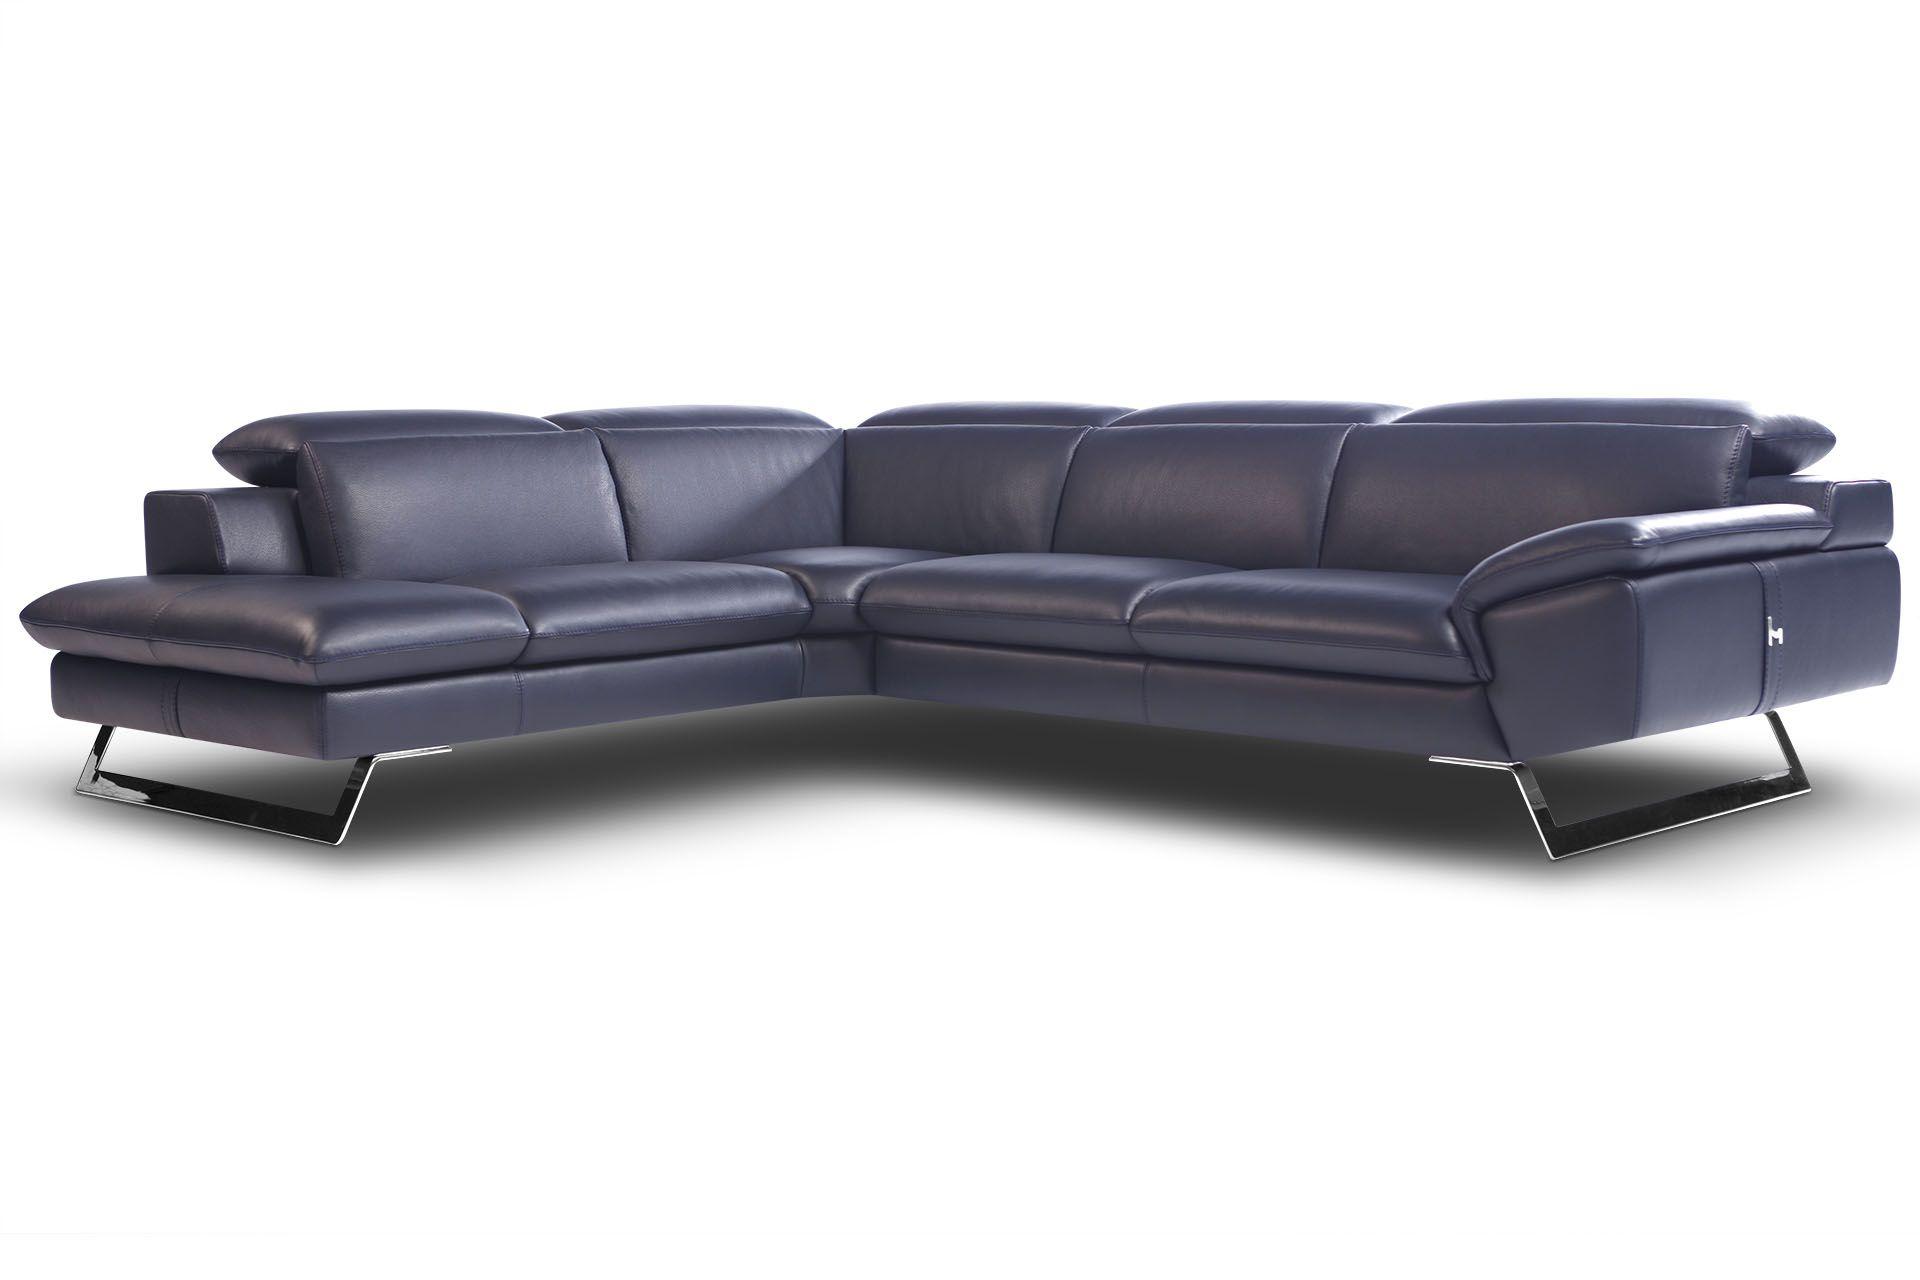 Zuma Nicoletti Home Sofa Pinterest Furniture Ideas And  # Muebles Lula Medellin